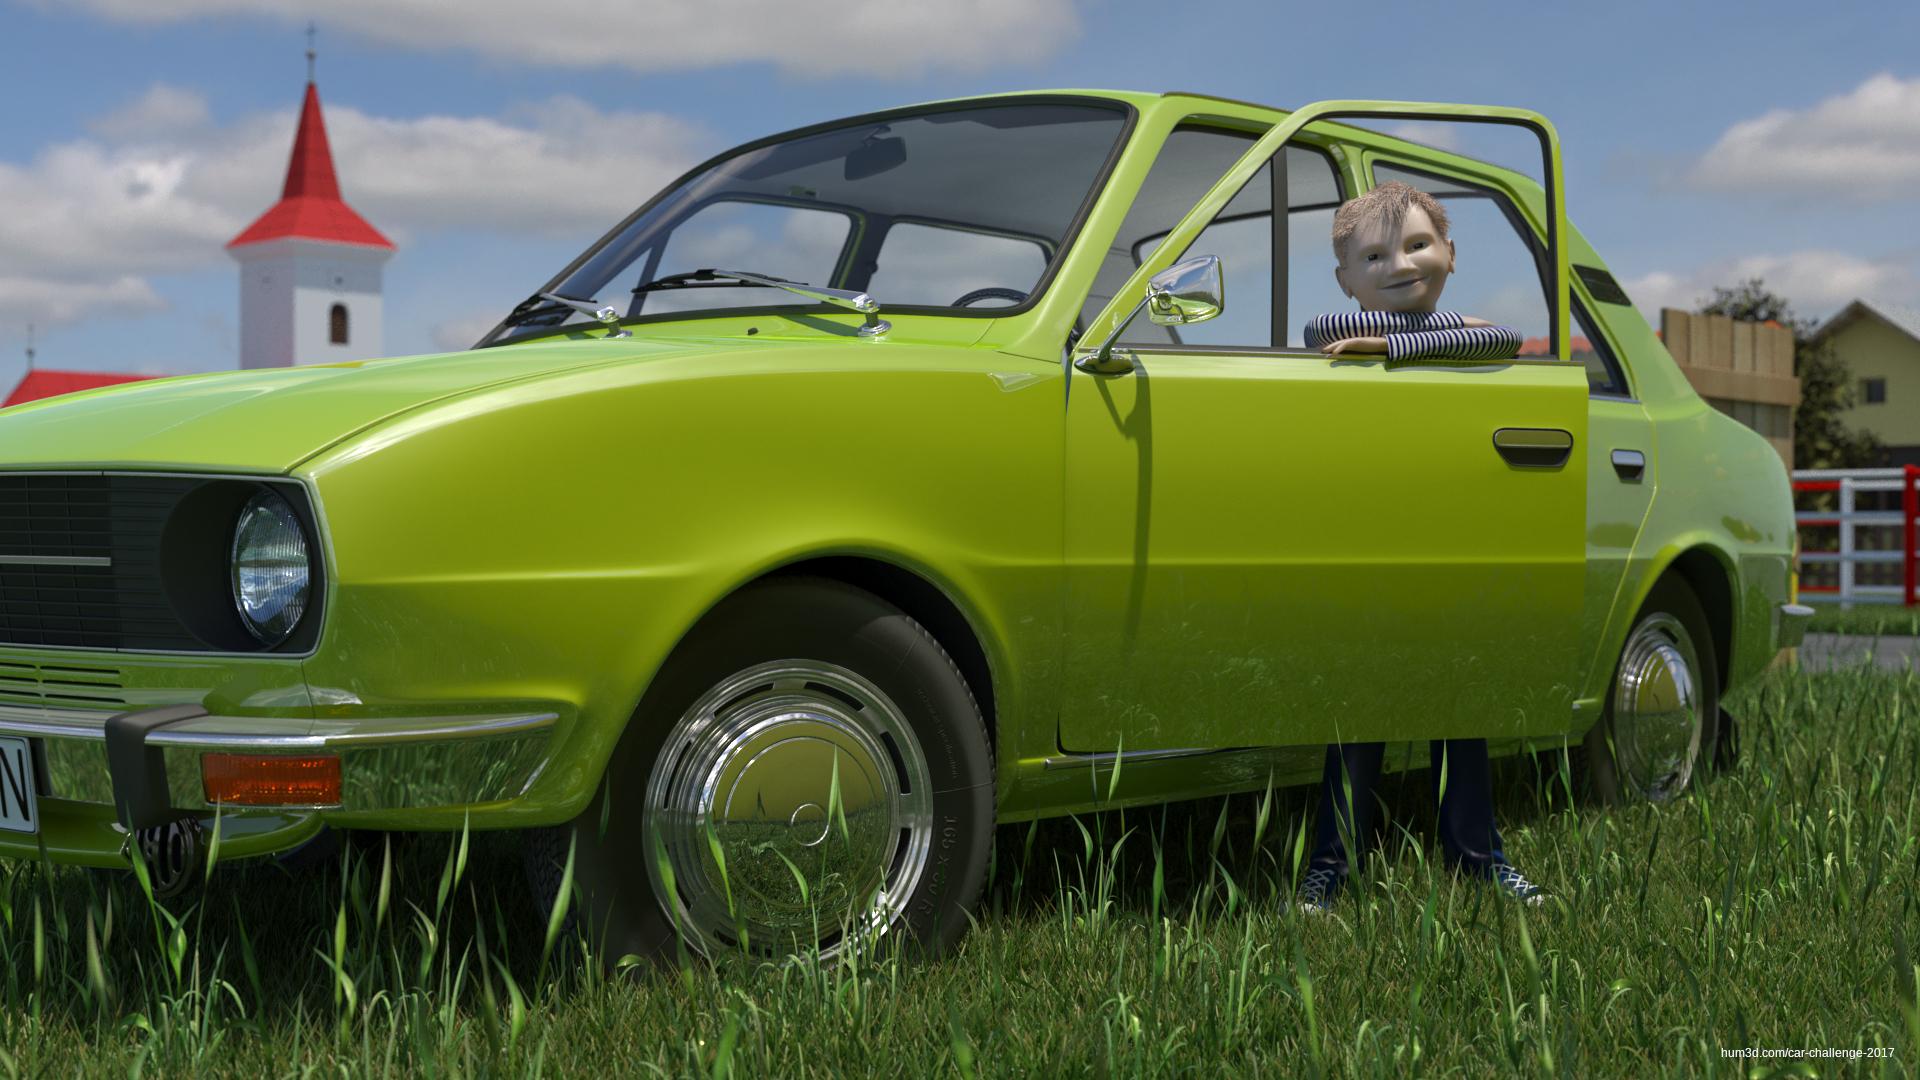 Father's car 3d art